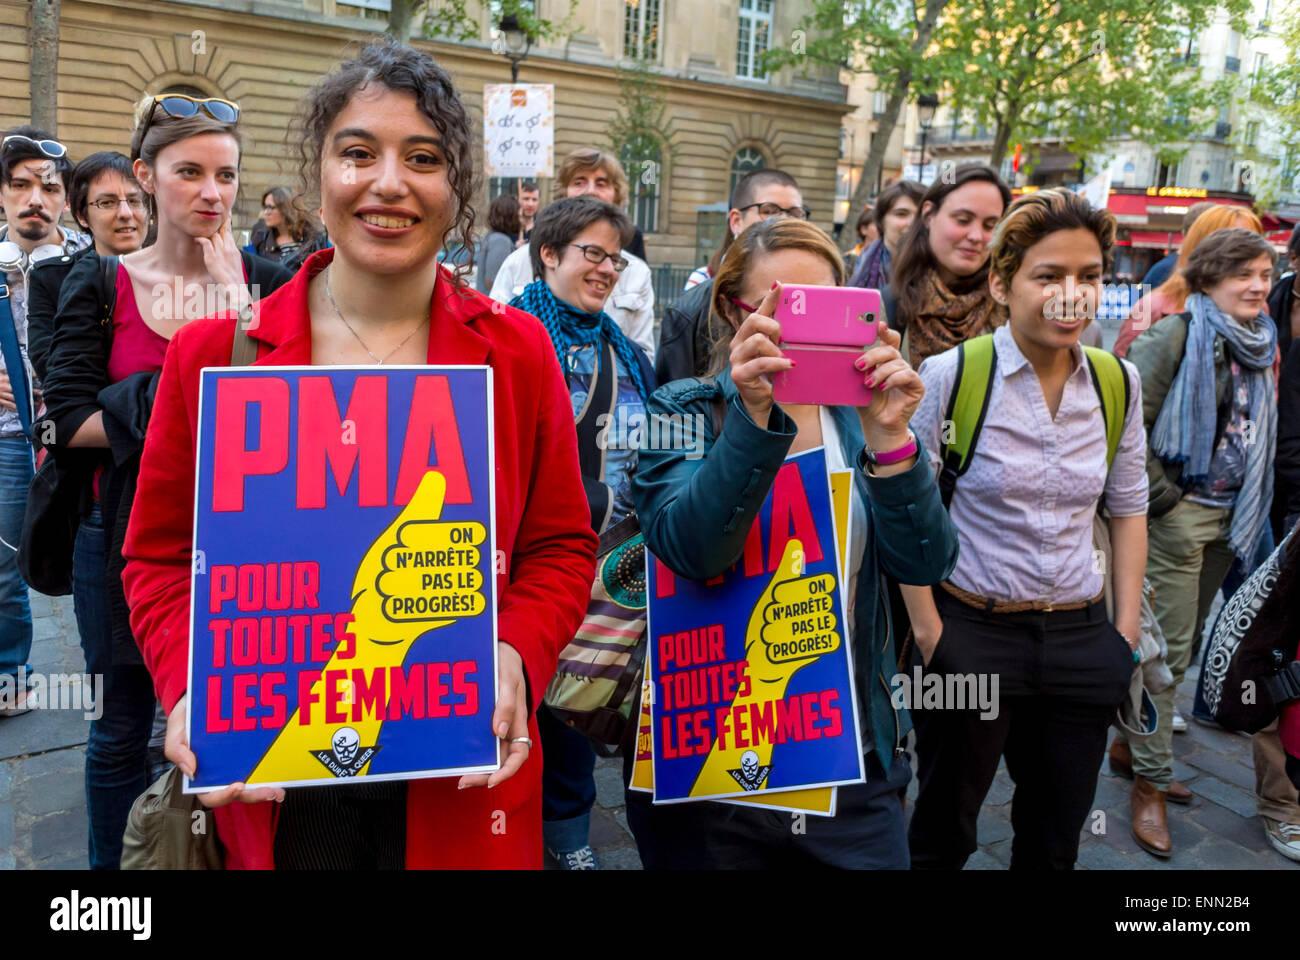 Anniversario Di Matrimonio In Francese.Parigi Francia Manifestazione In Strada Secondo Anniversario